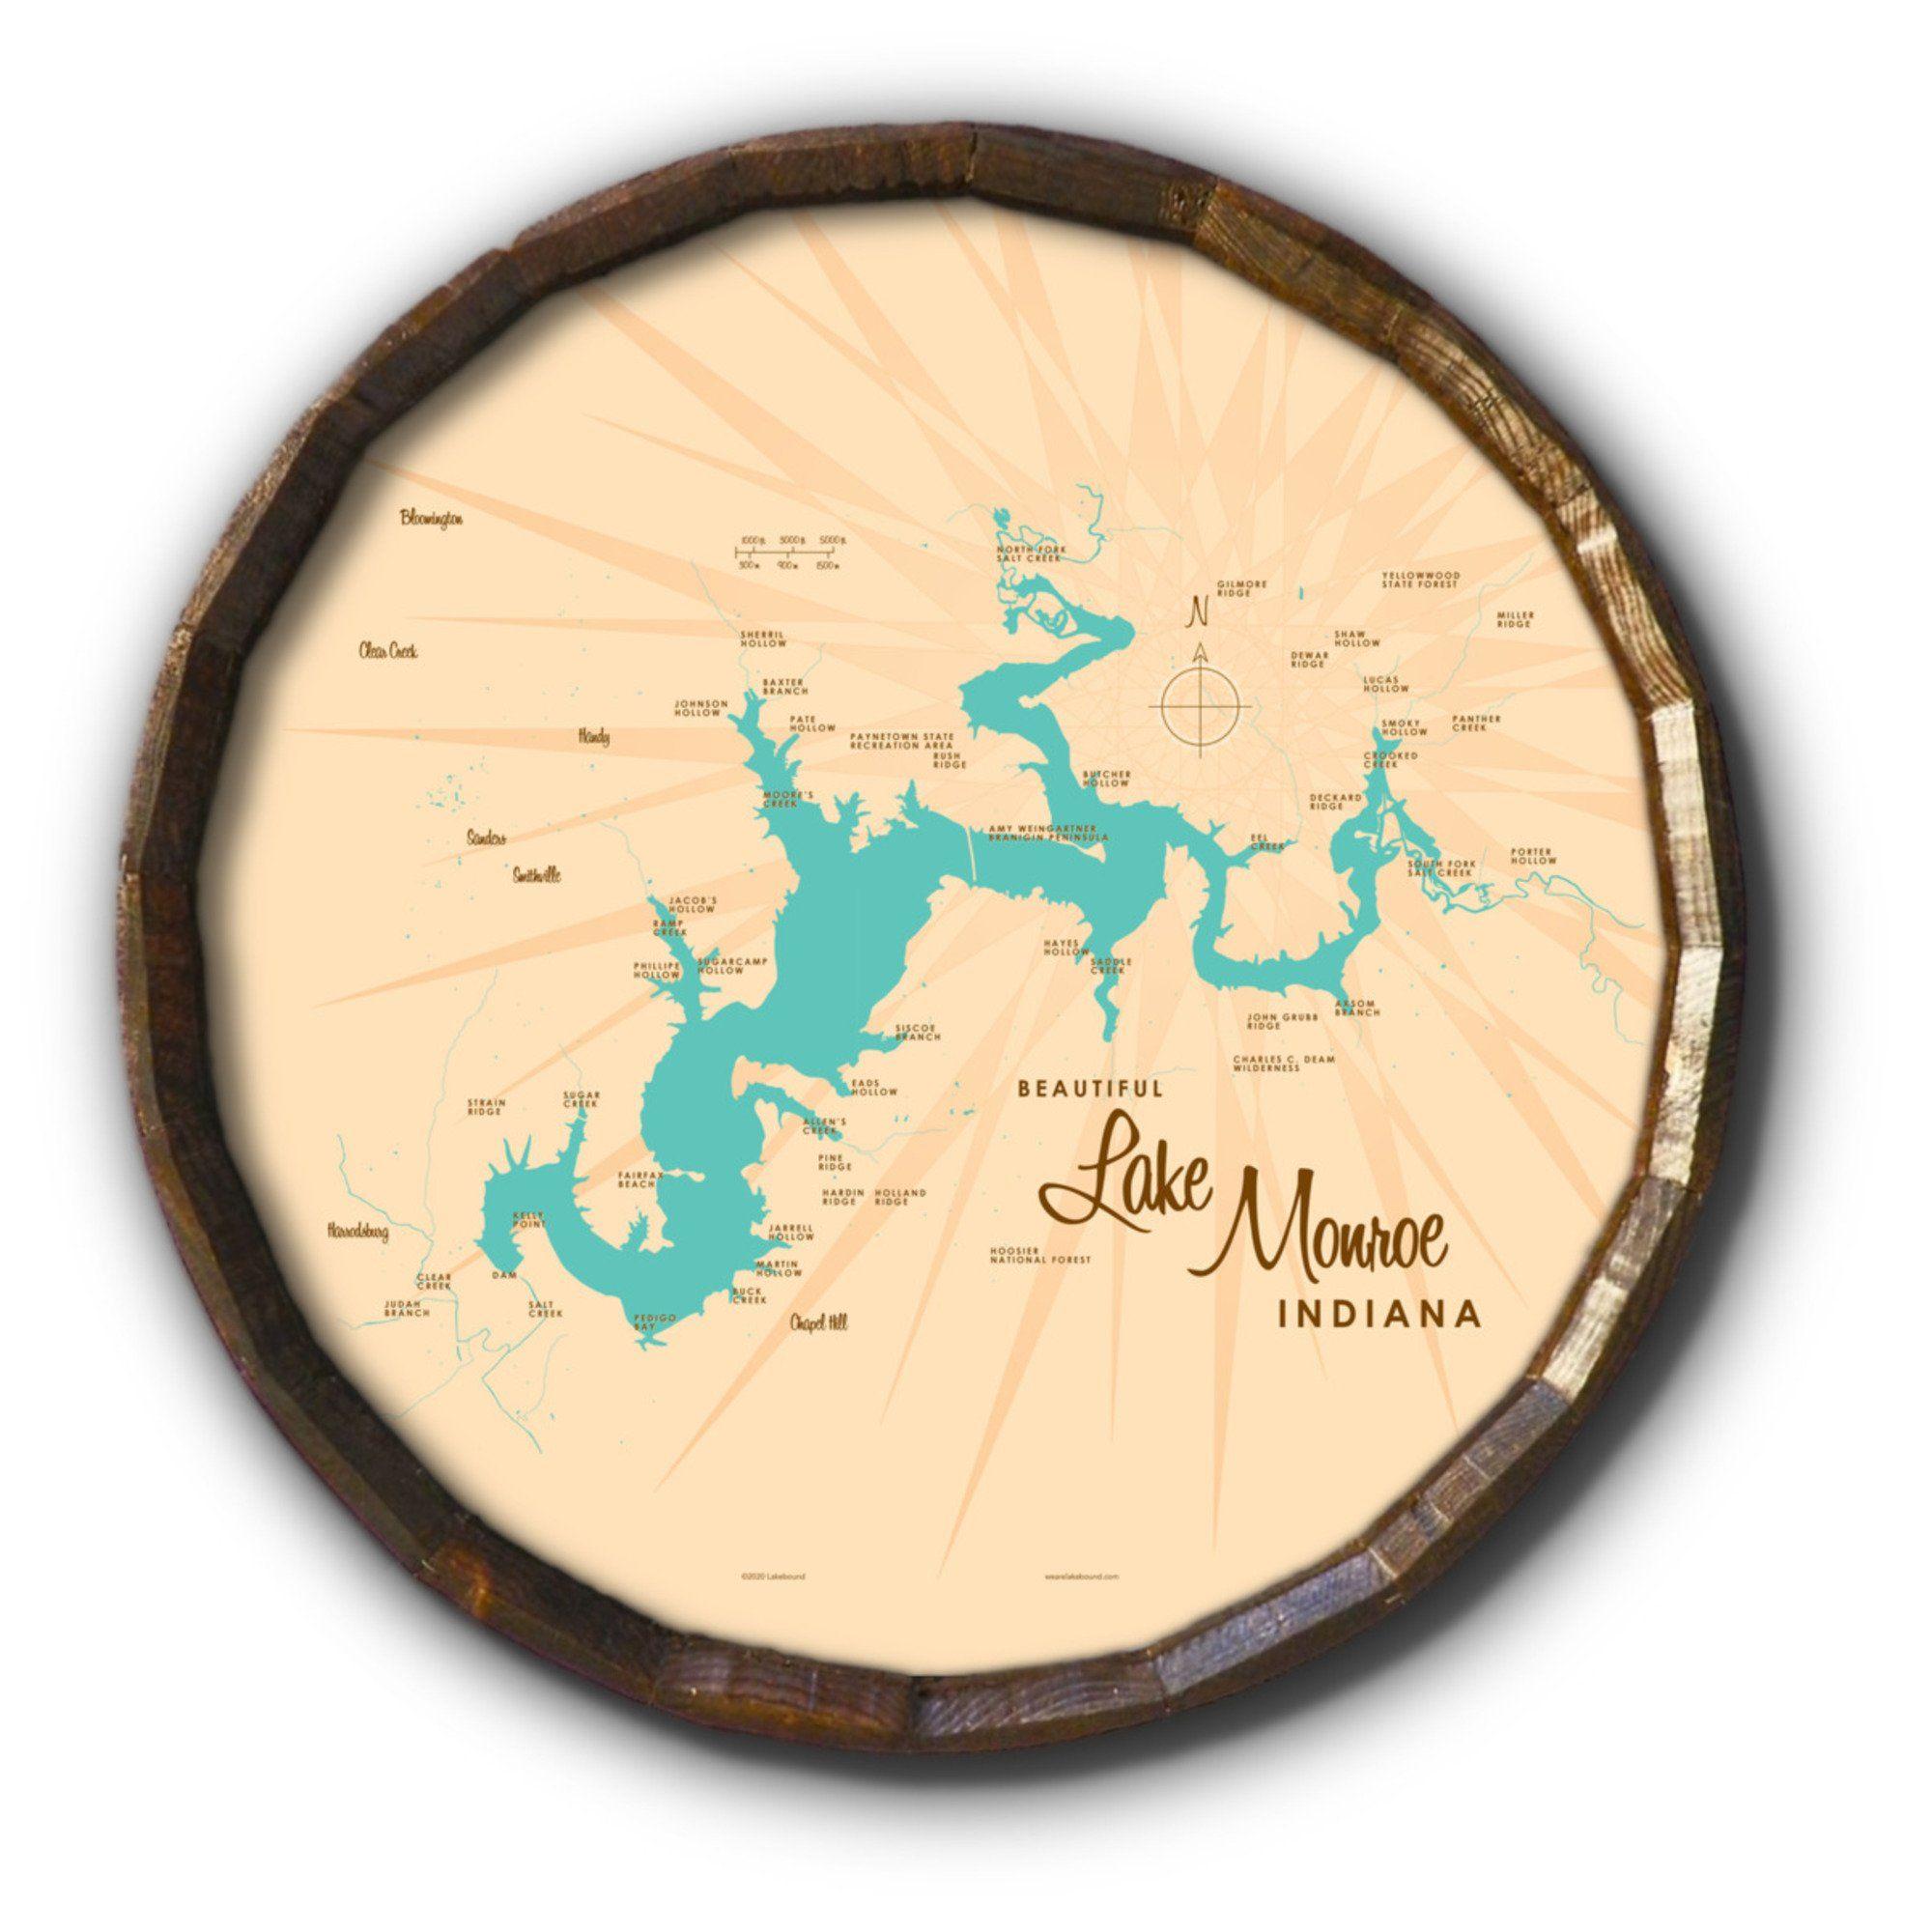 Lake Monroe Indiana, Barrel End Map Art - 21 x 21 inches / Black